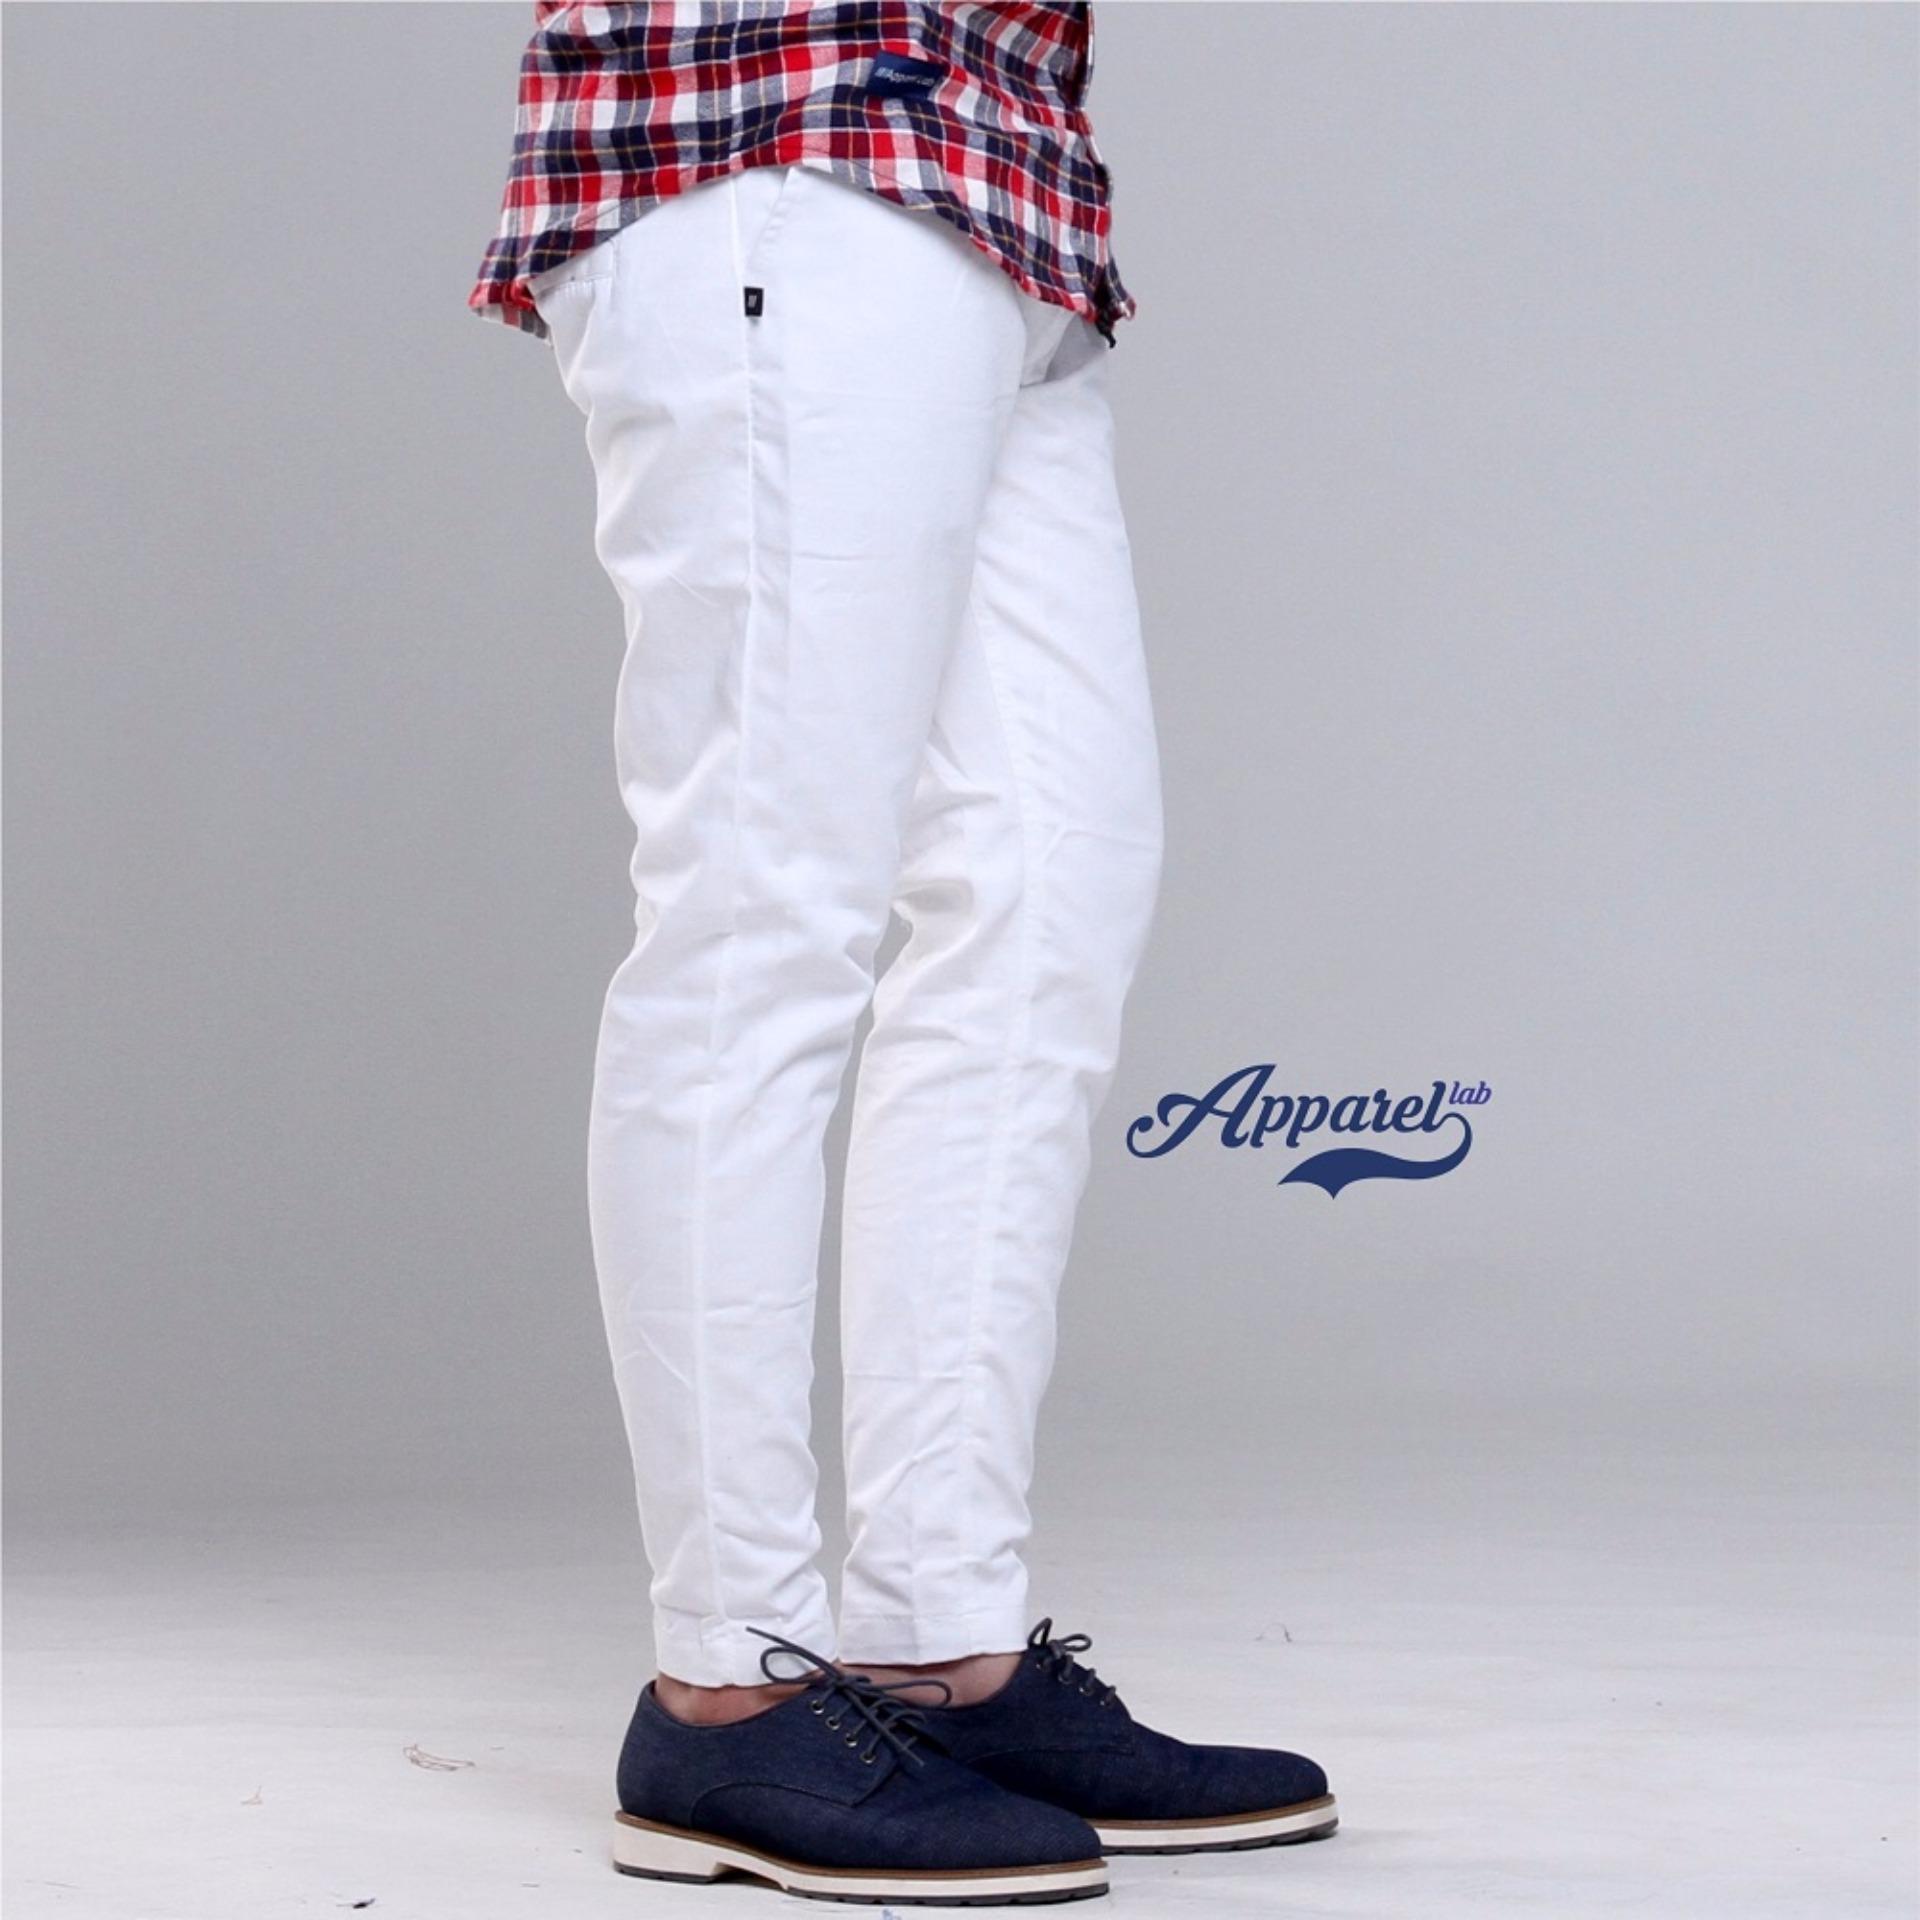 [PINGGANG KARET] Apparel Lab Chino Pants (White)